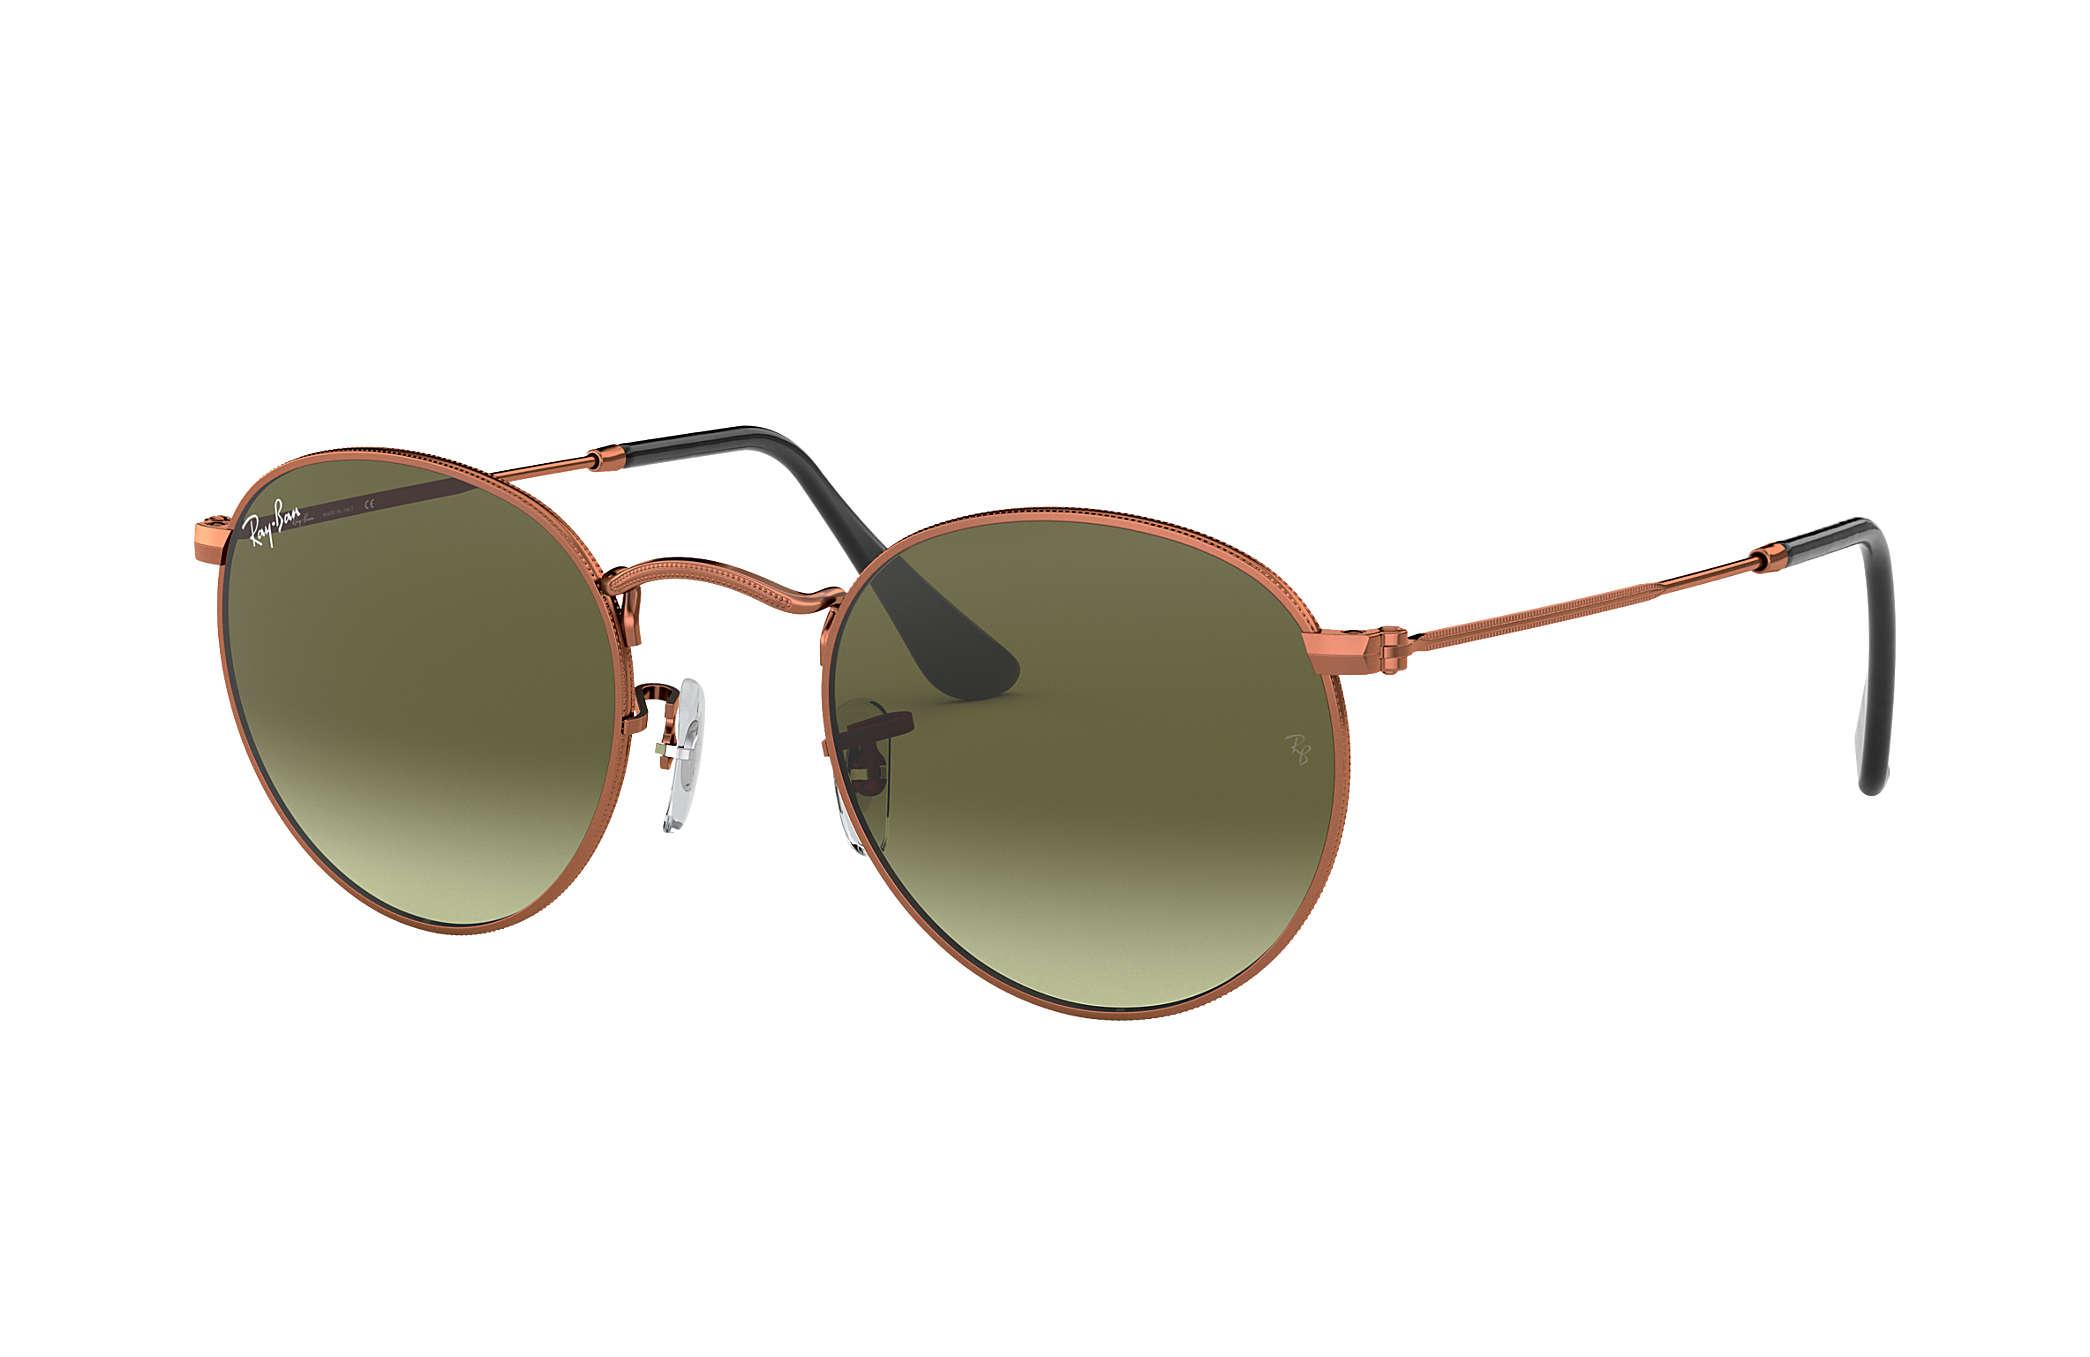 e502630a6da7 Ray-Ban Round Metal RB3447 Bronze-Copper - Metal - Green Lenses ...